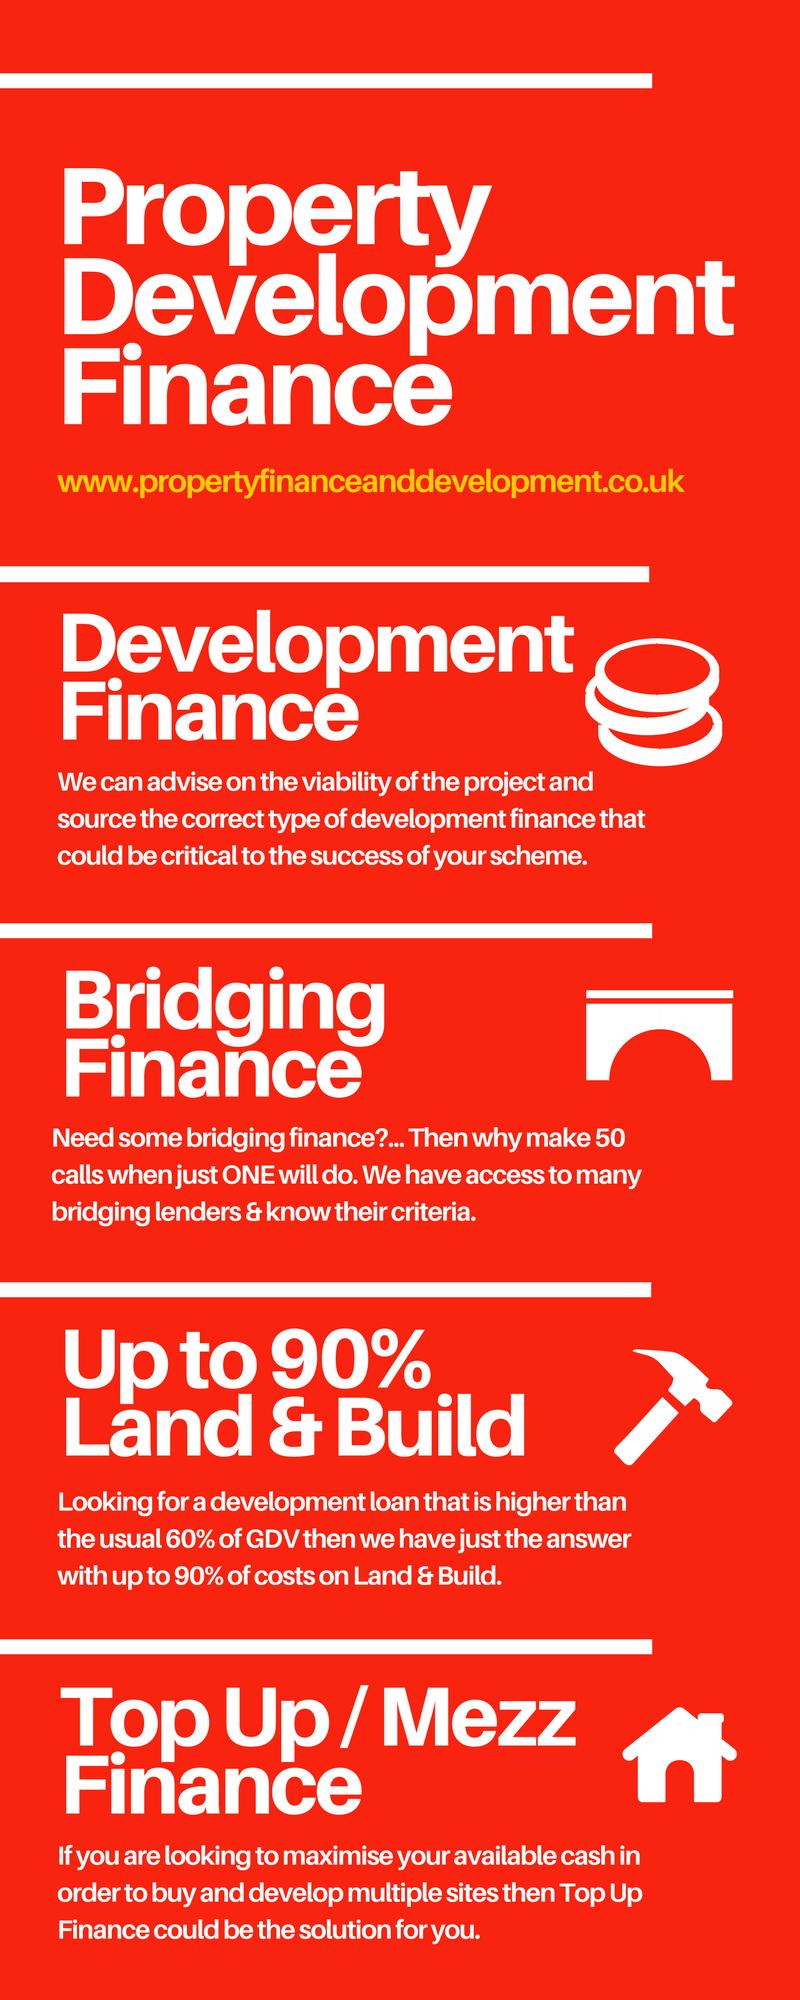 Types of Property Finance Development